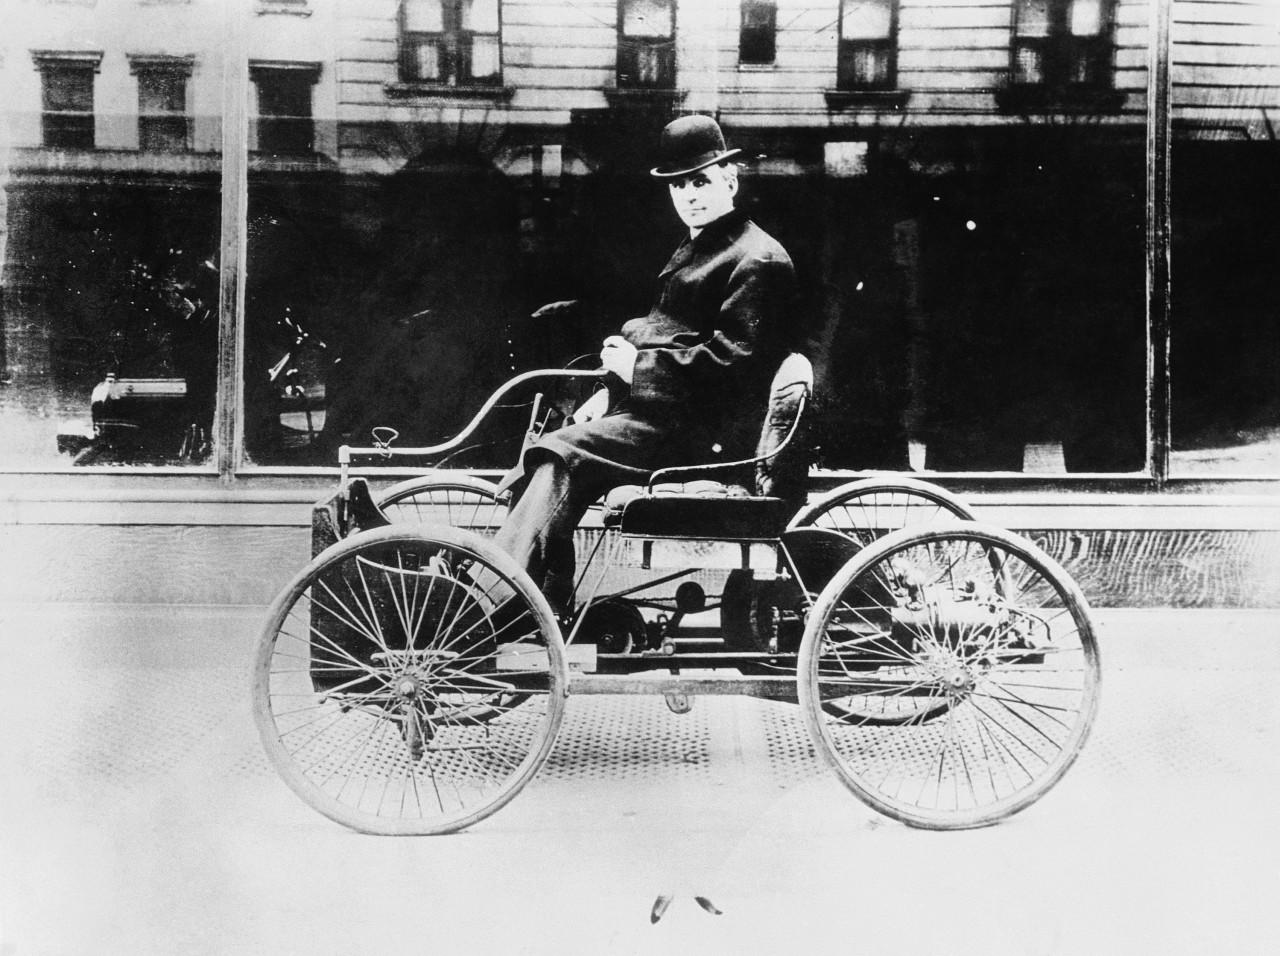 Генри Форд на первом автомобиле, который он создал, Мичиган, 1896